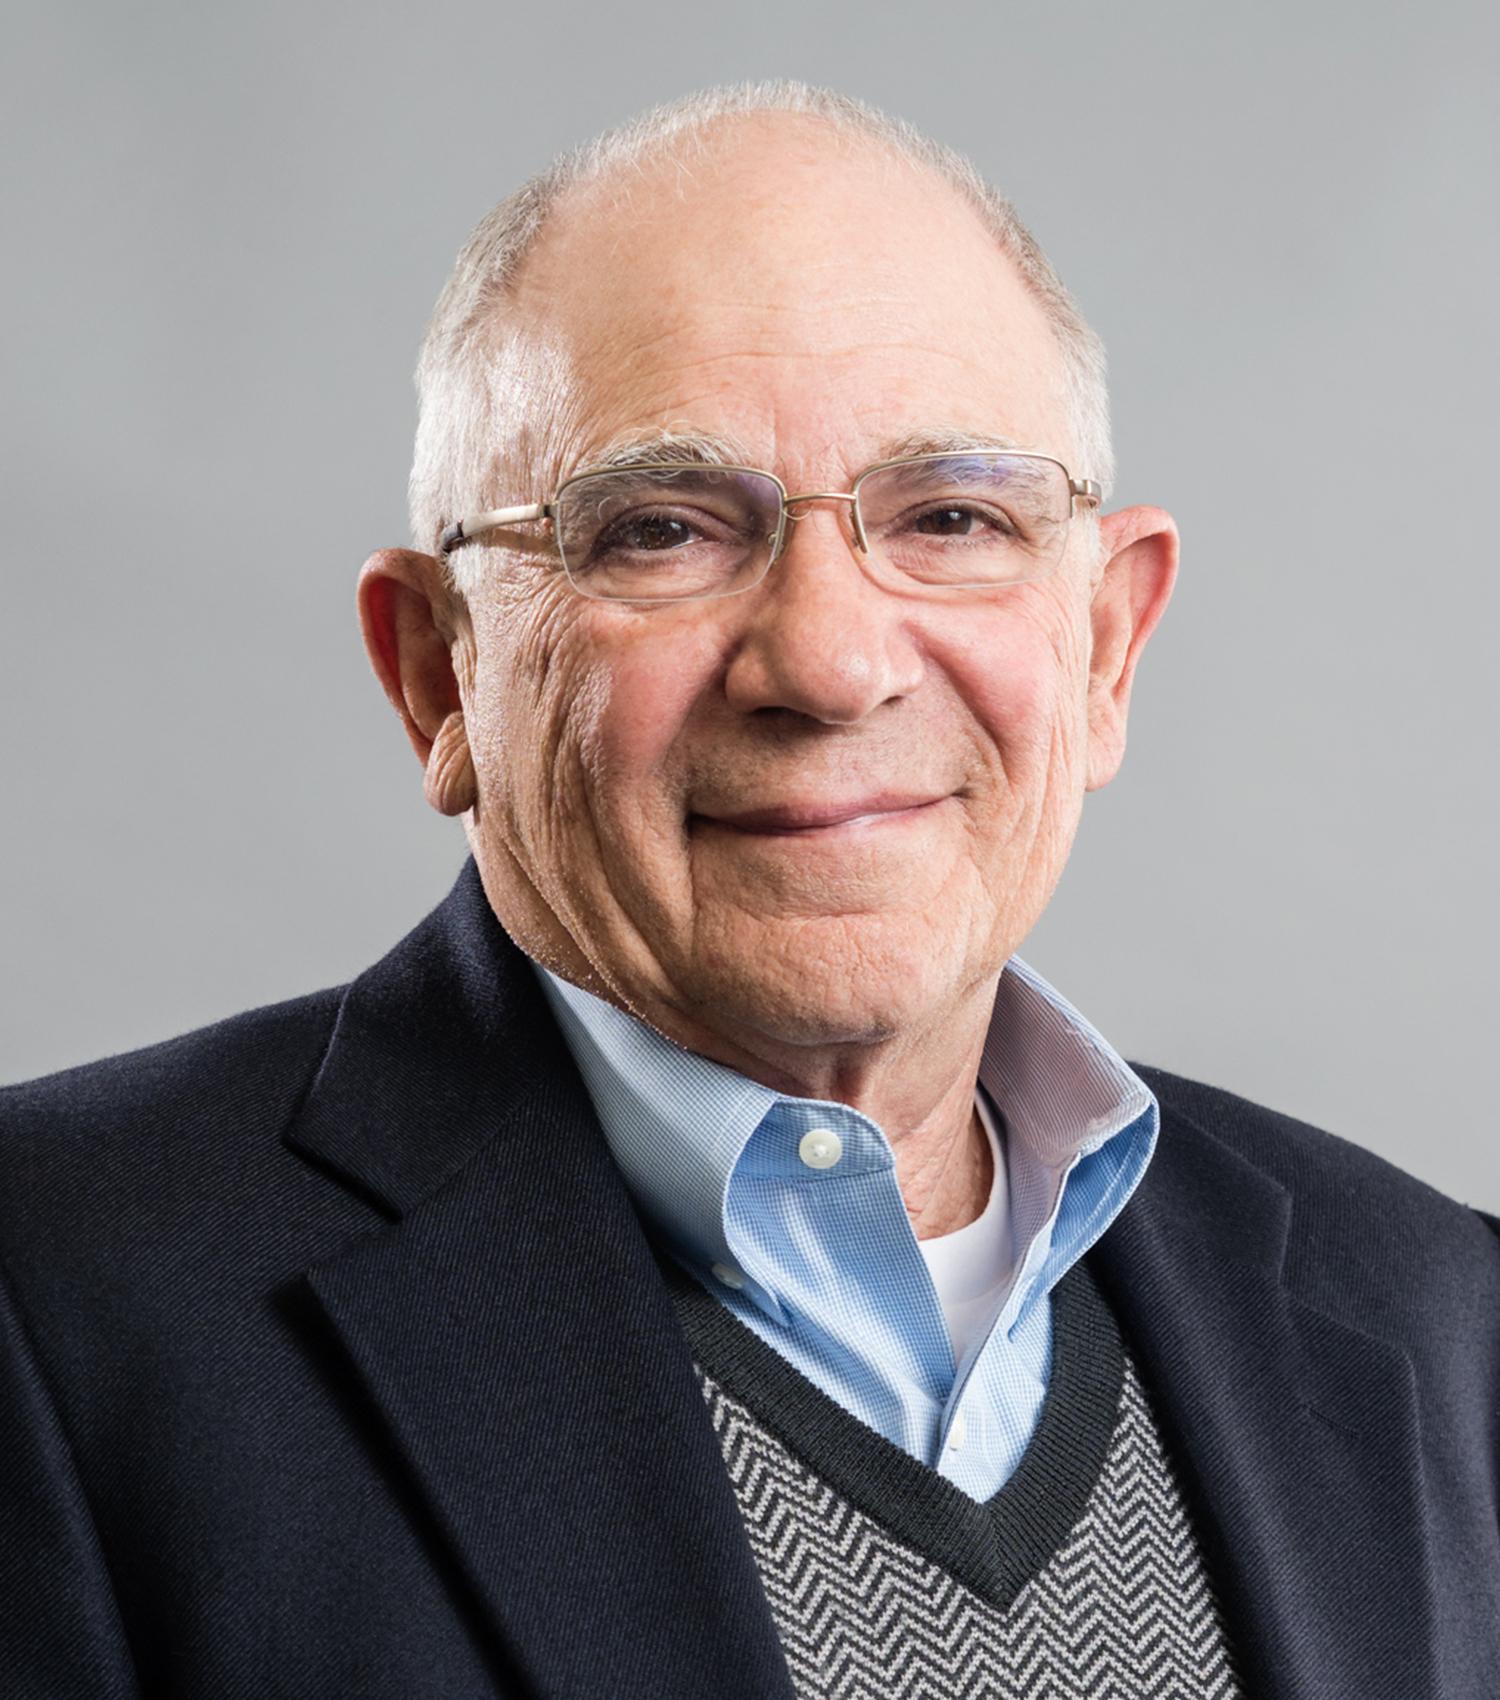 Norman Dreyfuss, Vice Chair